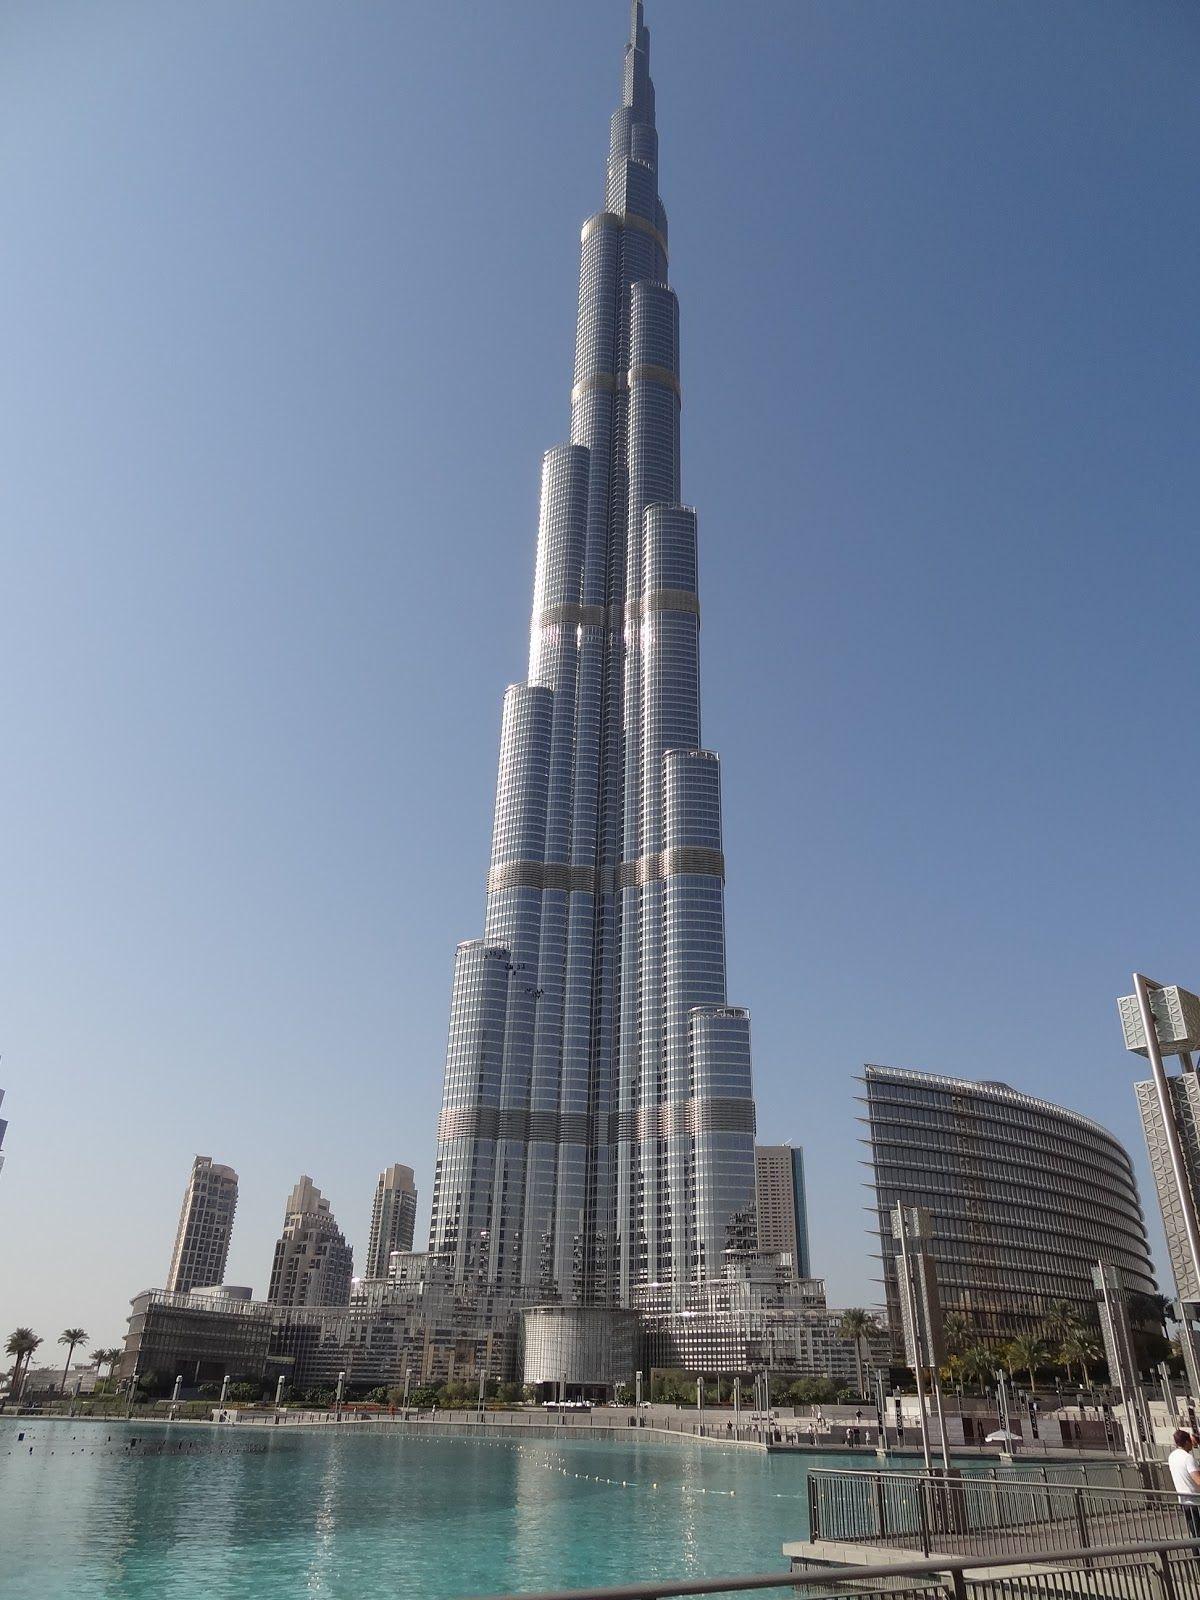 Burj khalifa dubai tallest building inthe world burj for The largest hotel in dubai